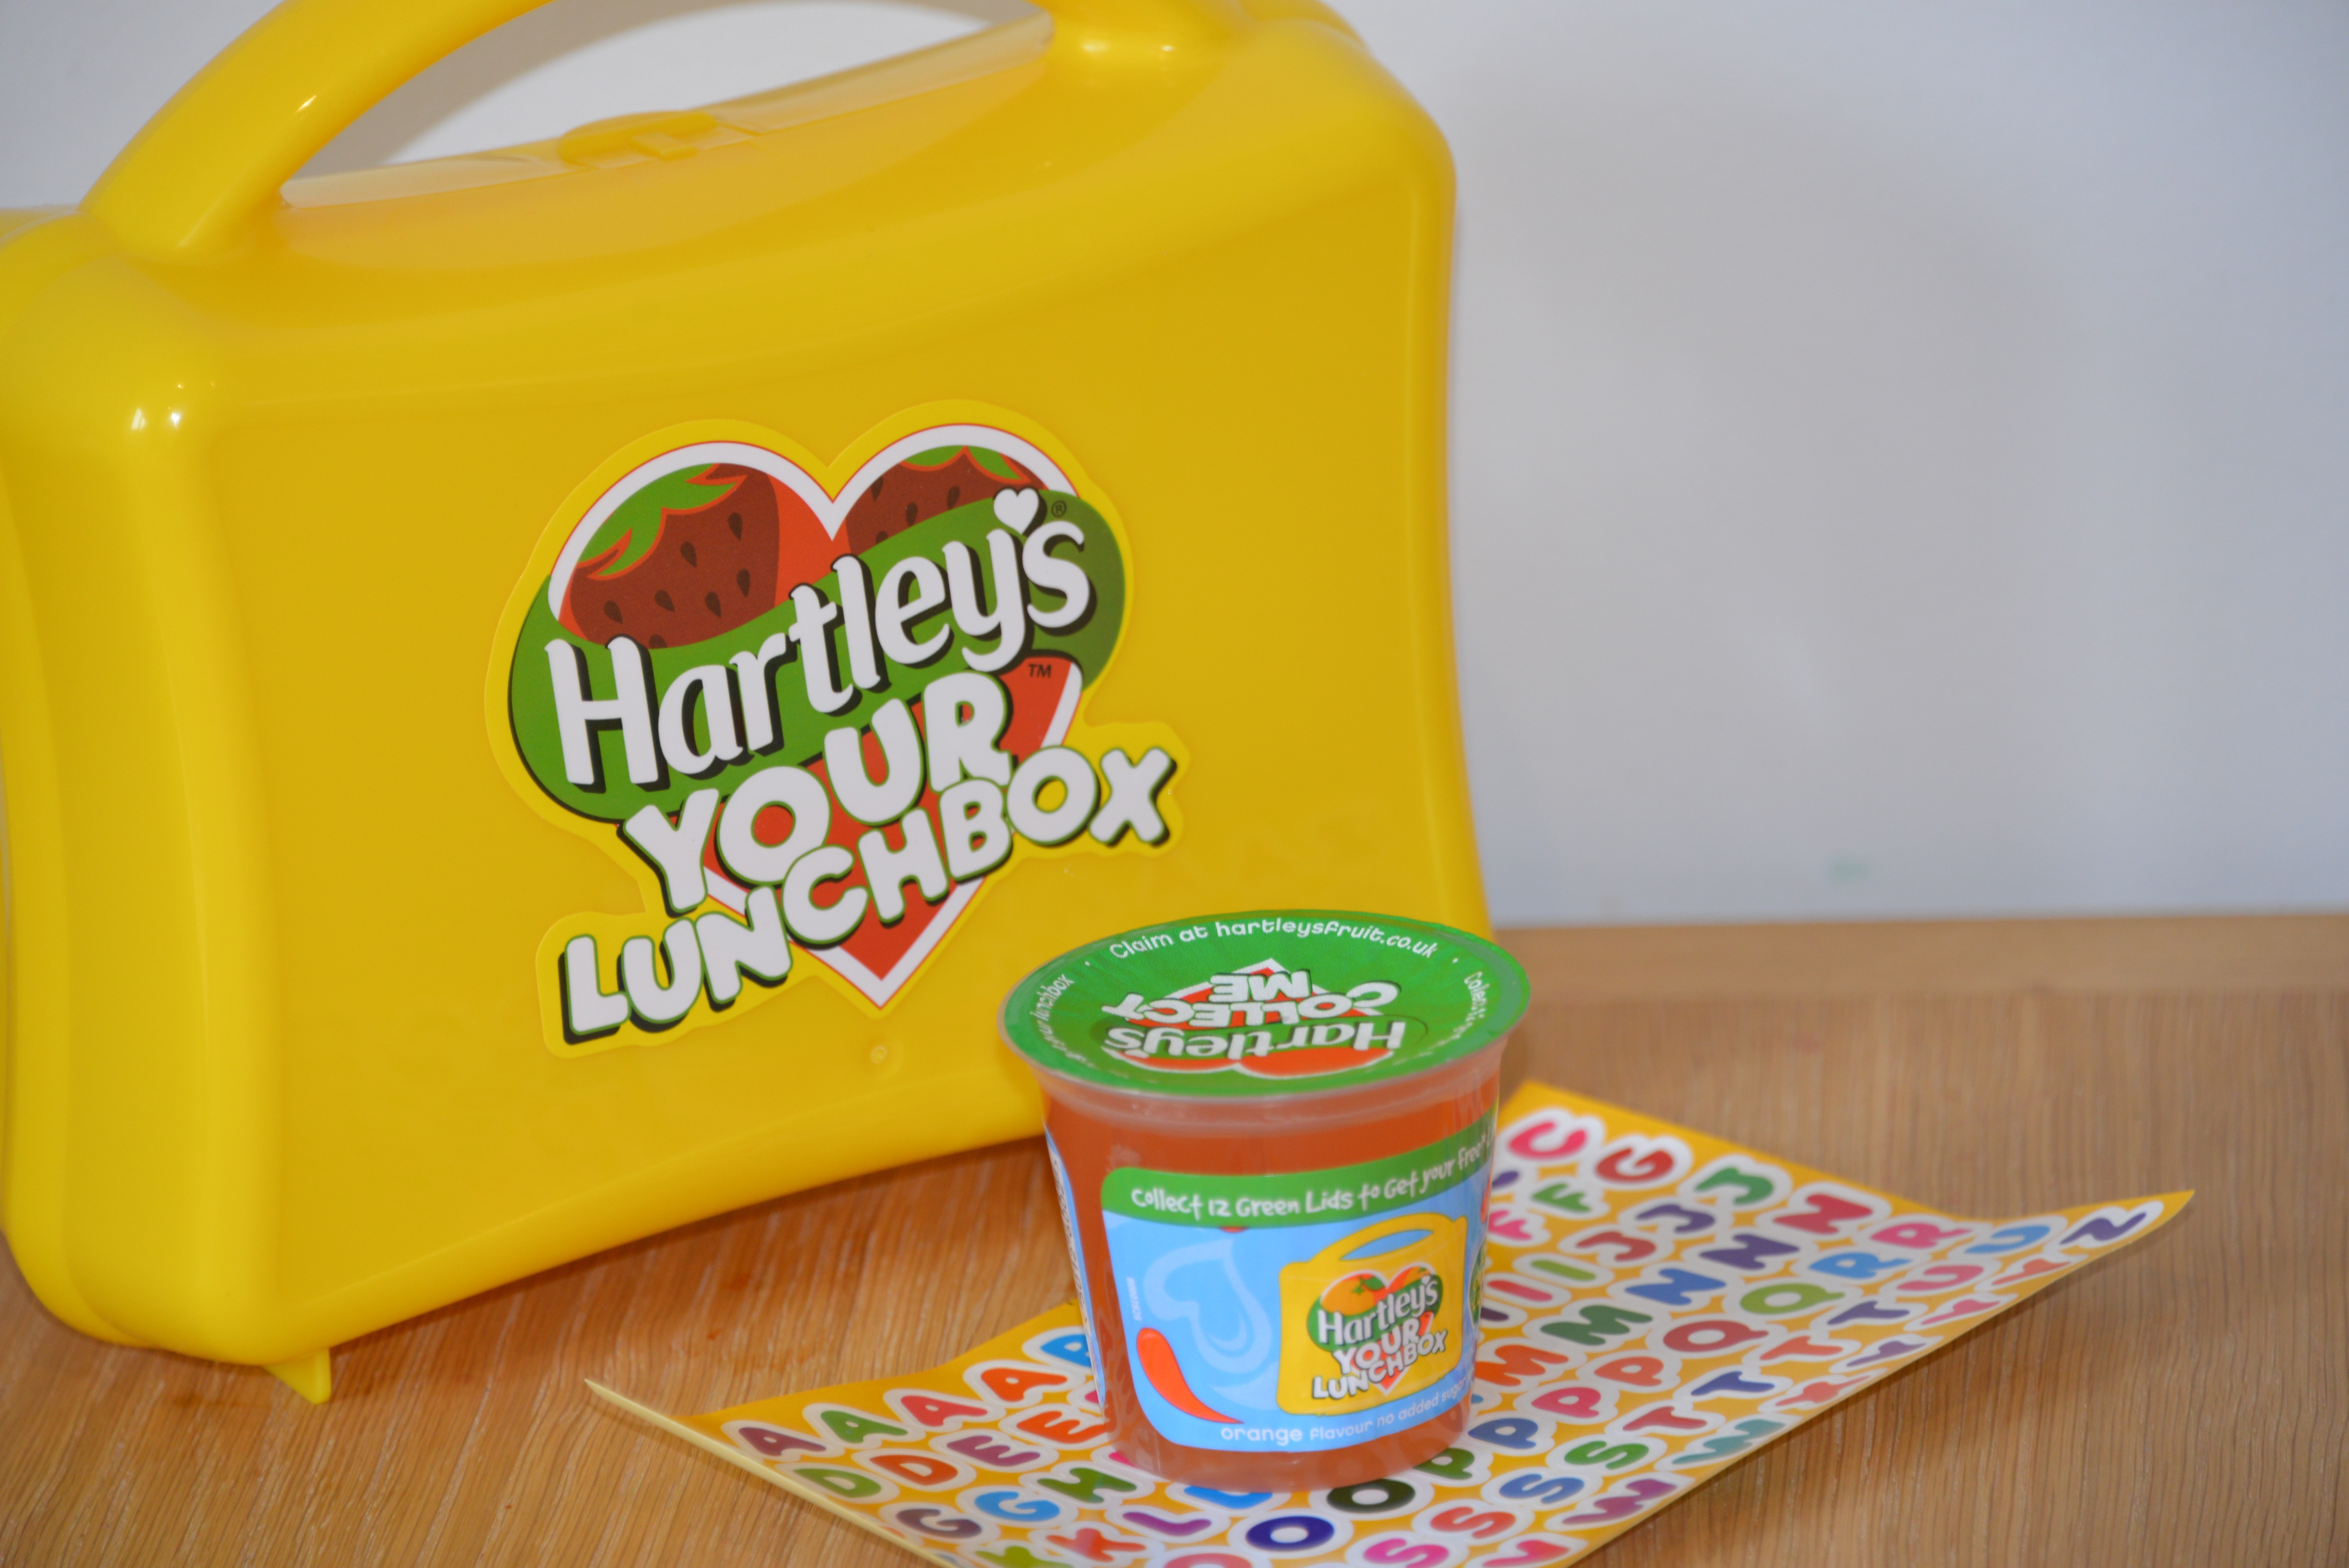 Hartley's jelly